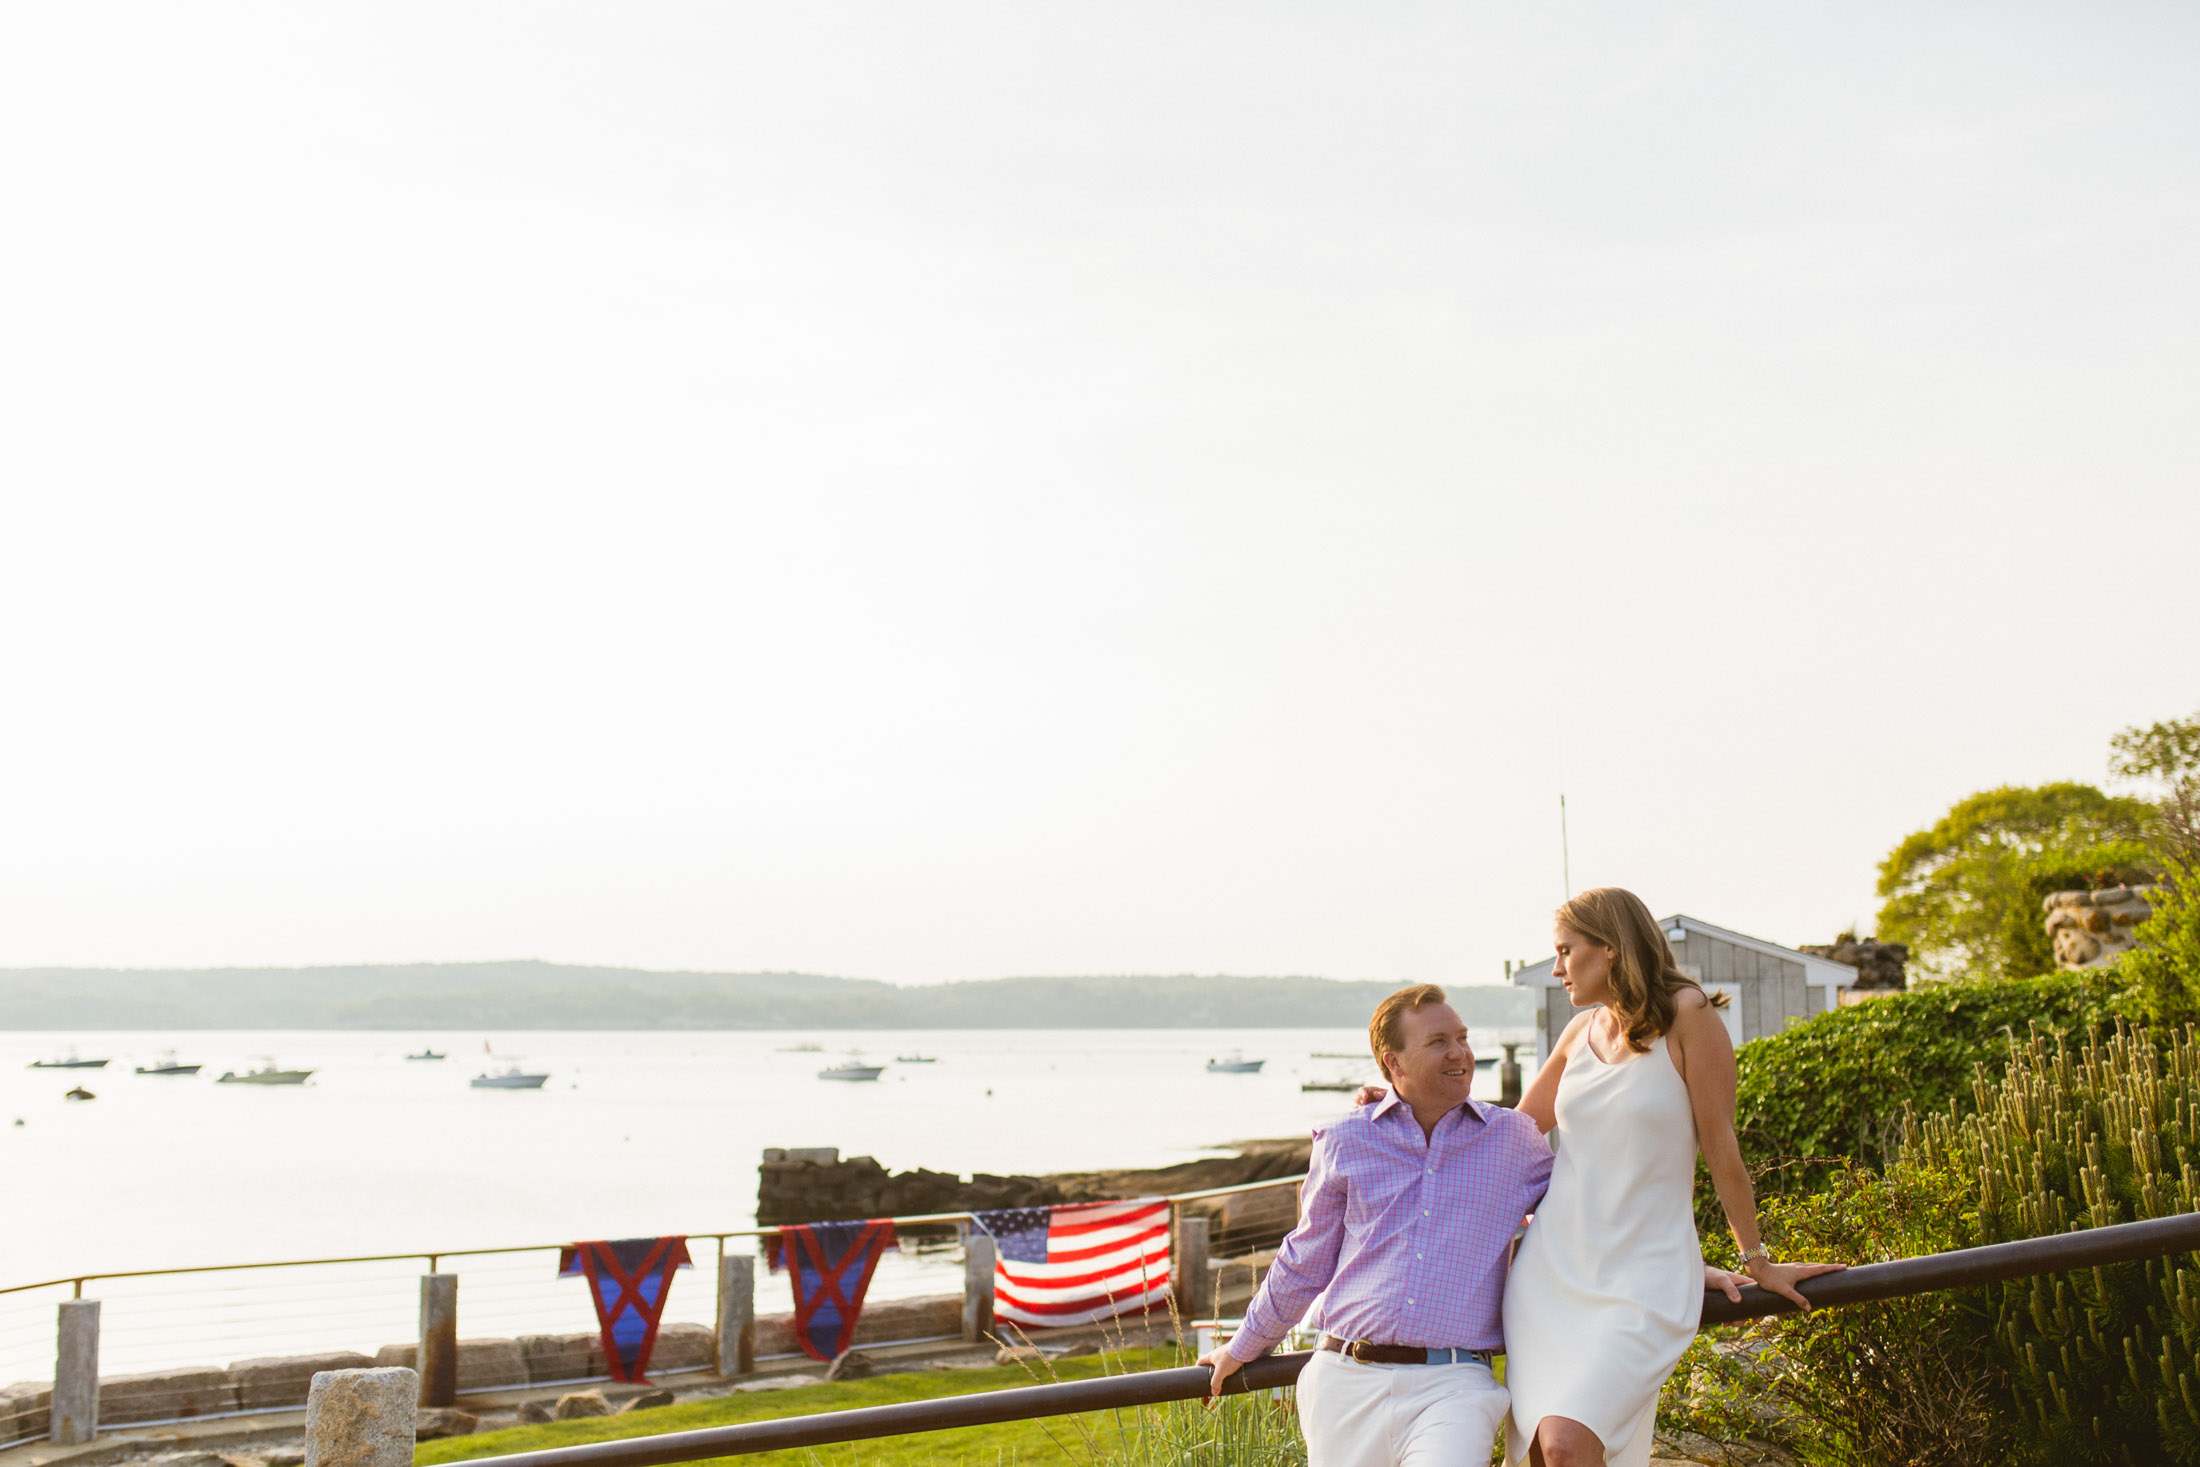 Eastern-Point-yacht-Club-Engagement-2.jpg